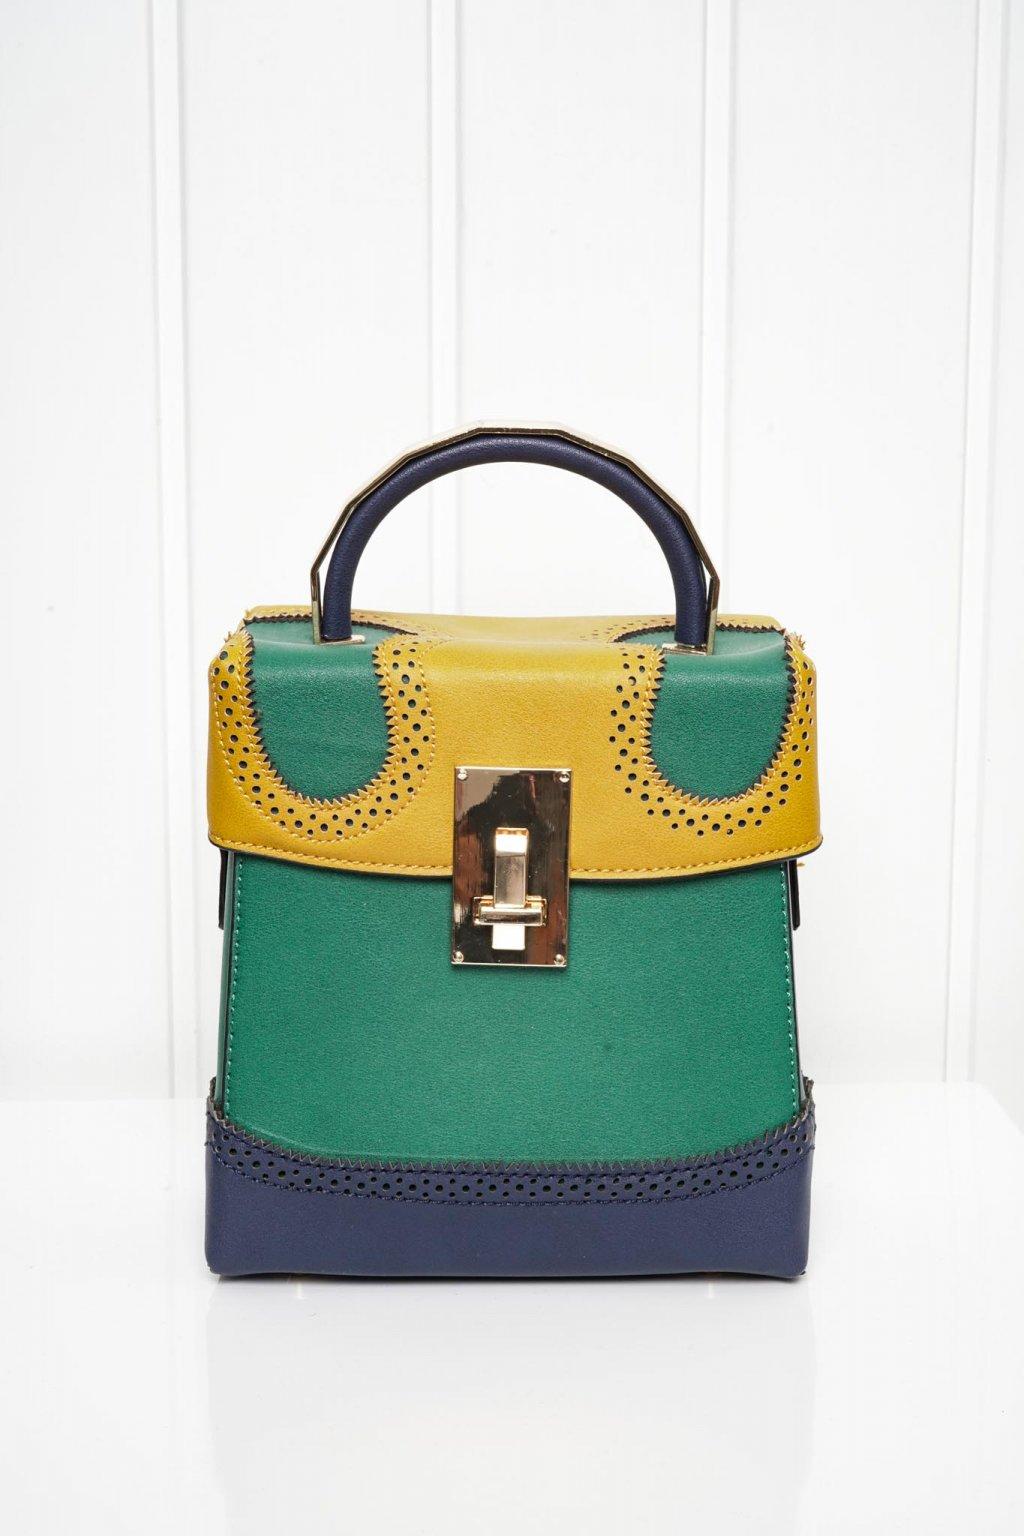 Kabelka, crossbody, ruksak, shopping bag, shopperka, 500